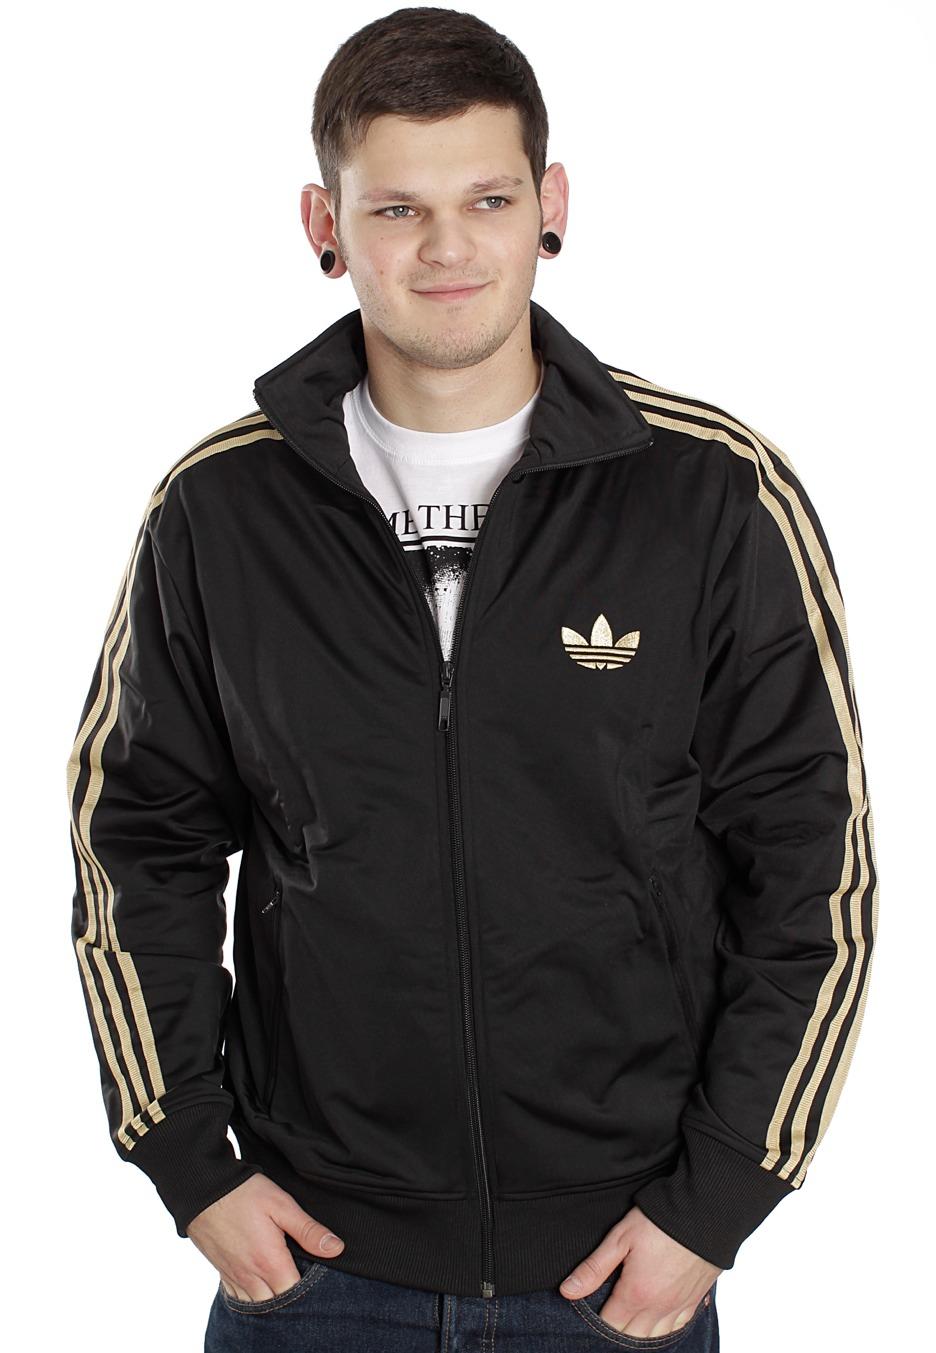 df91a639279c Adidas - Firebird Black Metallic Gold - Track Jacket - Streetwear Shop -  Impericon.com UK